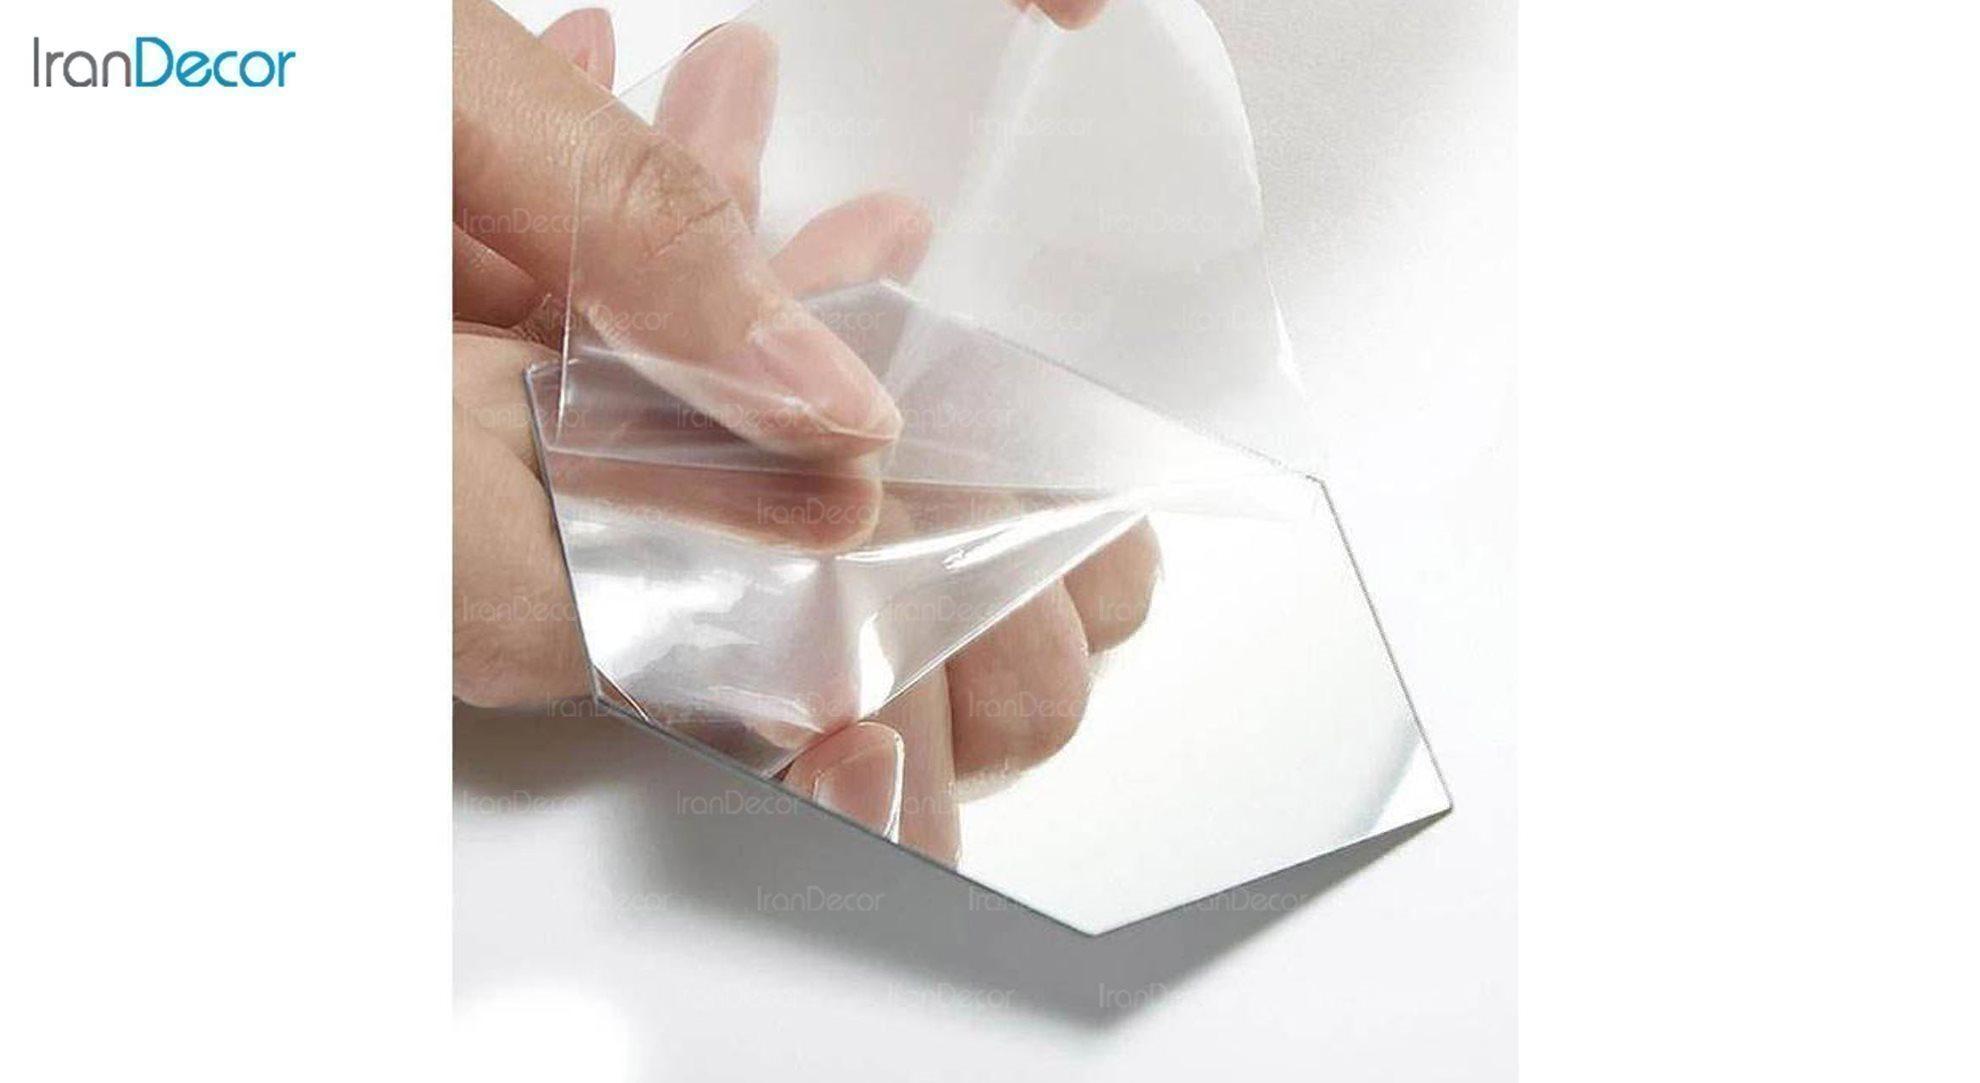 آینه پلکسی گلس طرح قلب رومادون کد 452 اندازه 30 سانتی متر نایلون ضد خش